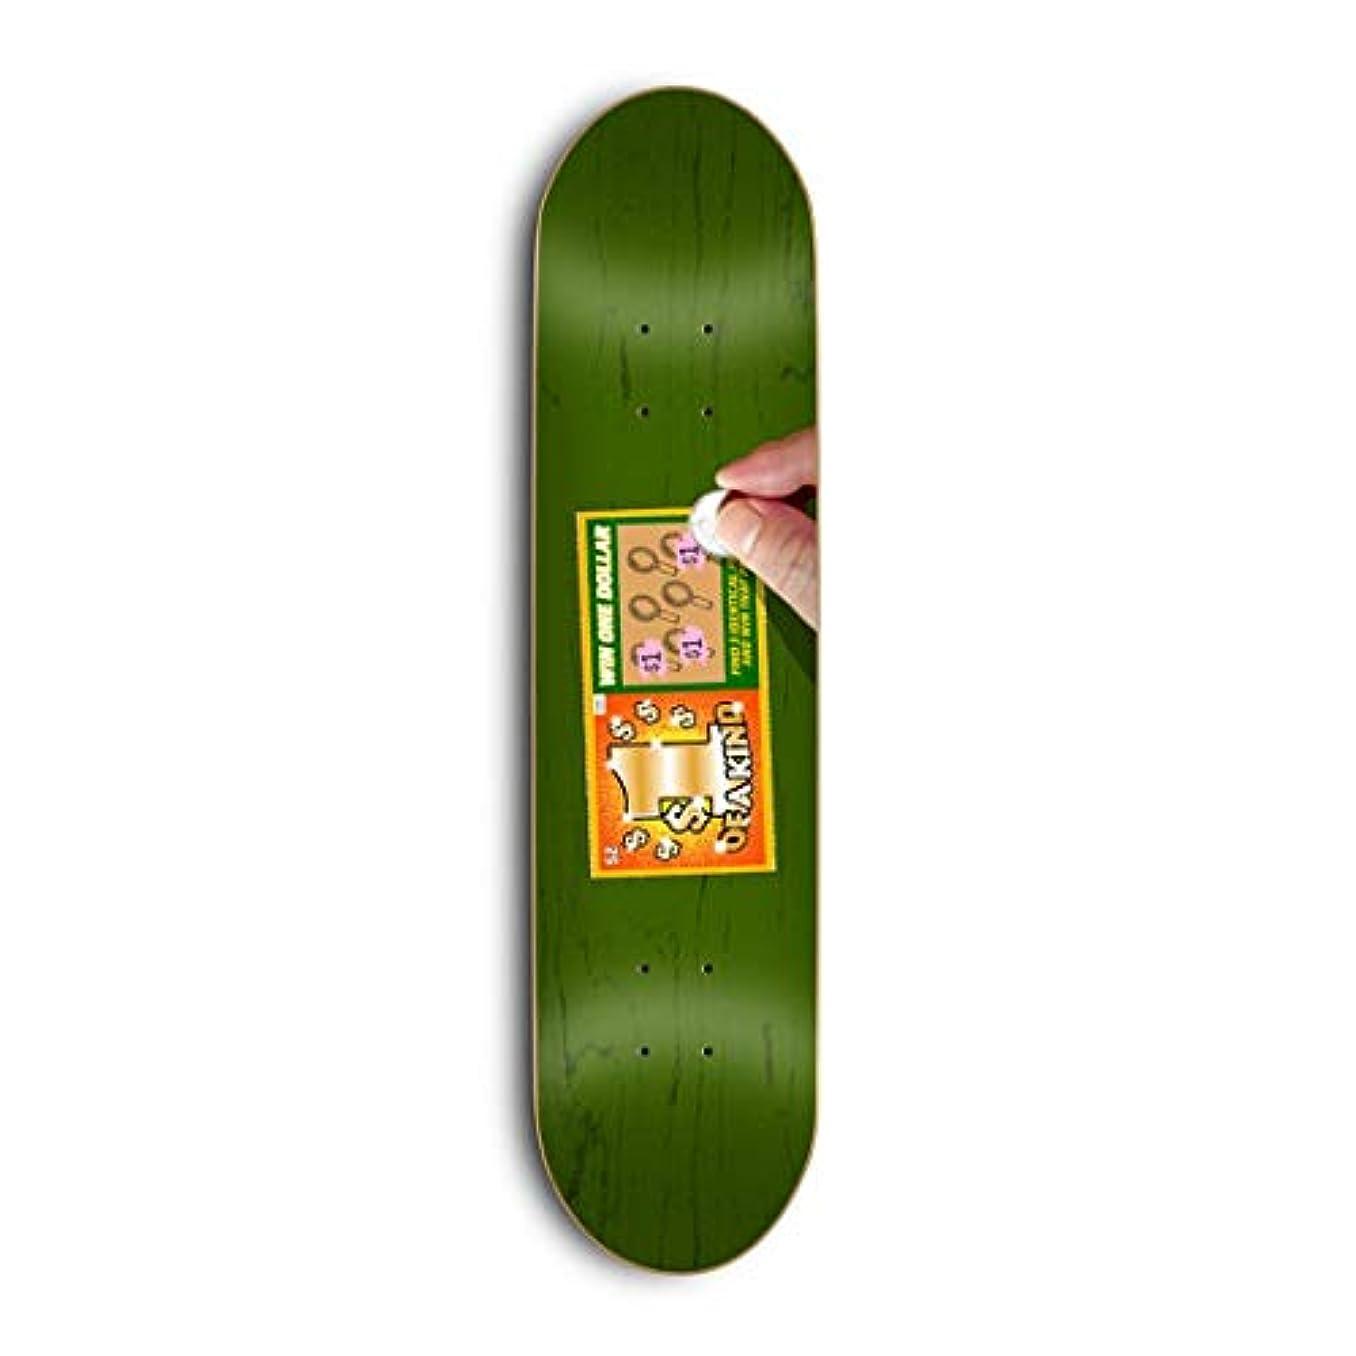 Skate Mental スケートボードデッキ Kleppan Scratcher 8.375インチ